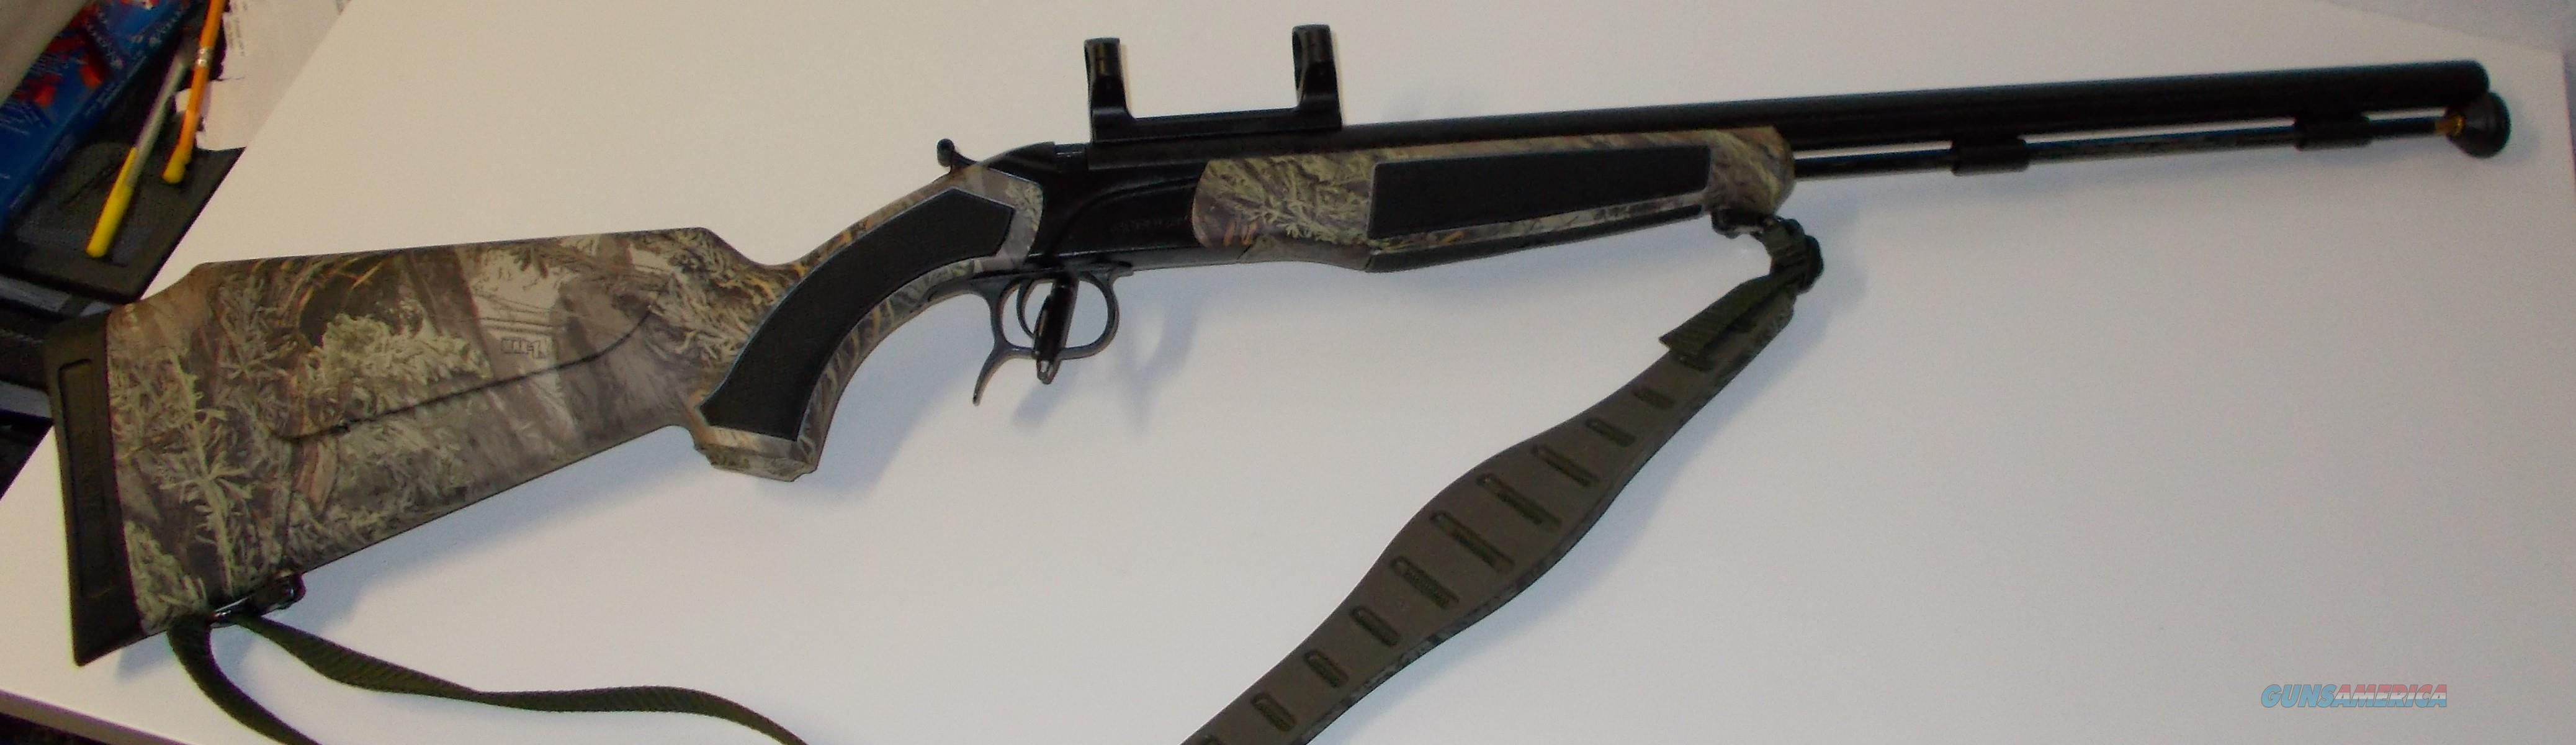 Knight 50 Caliber Muzzleloader